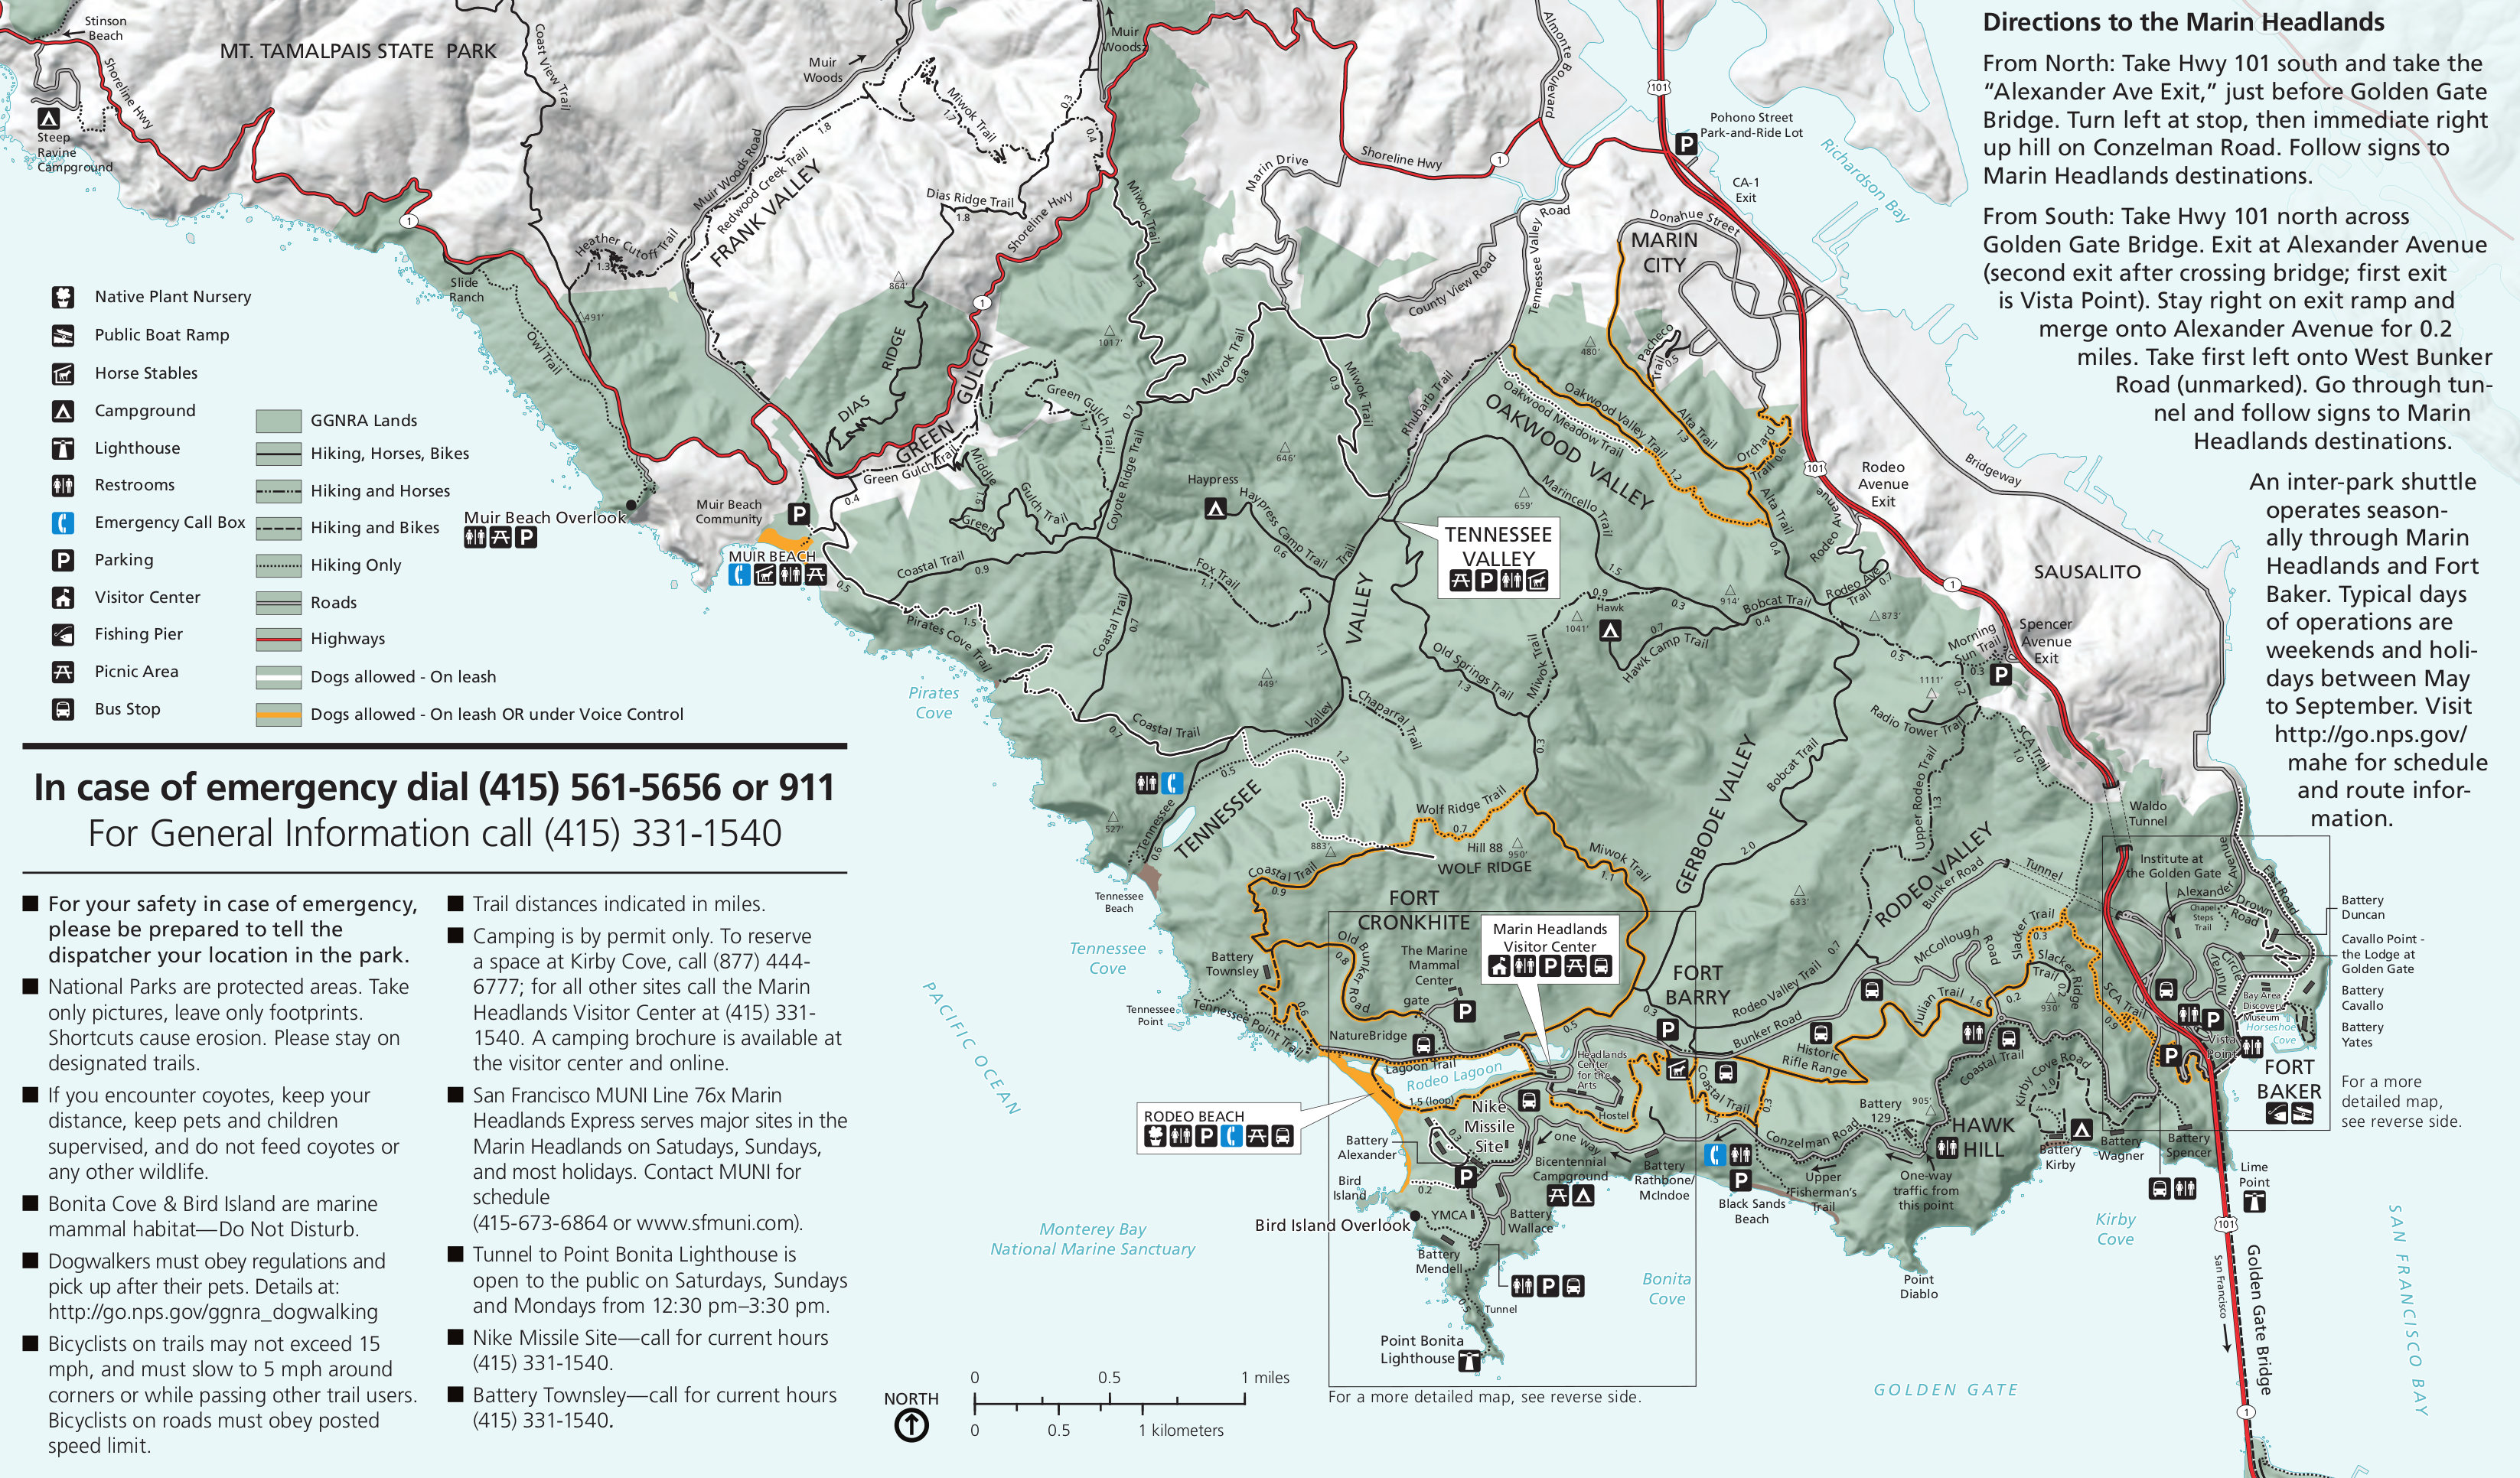 Marin Headlands Map File:NPS marin headlands map.   Wikimedia Commons